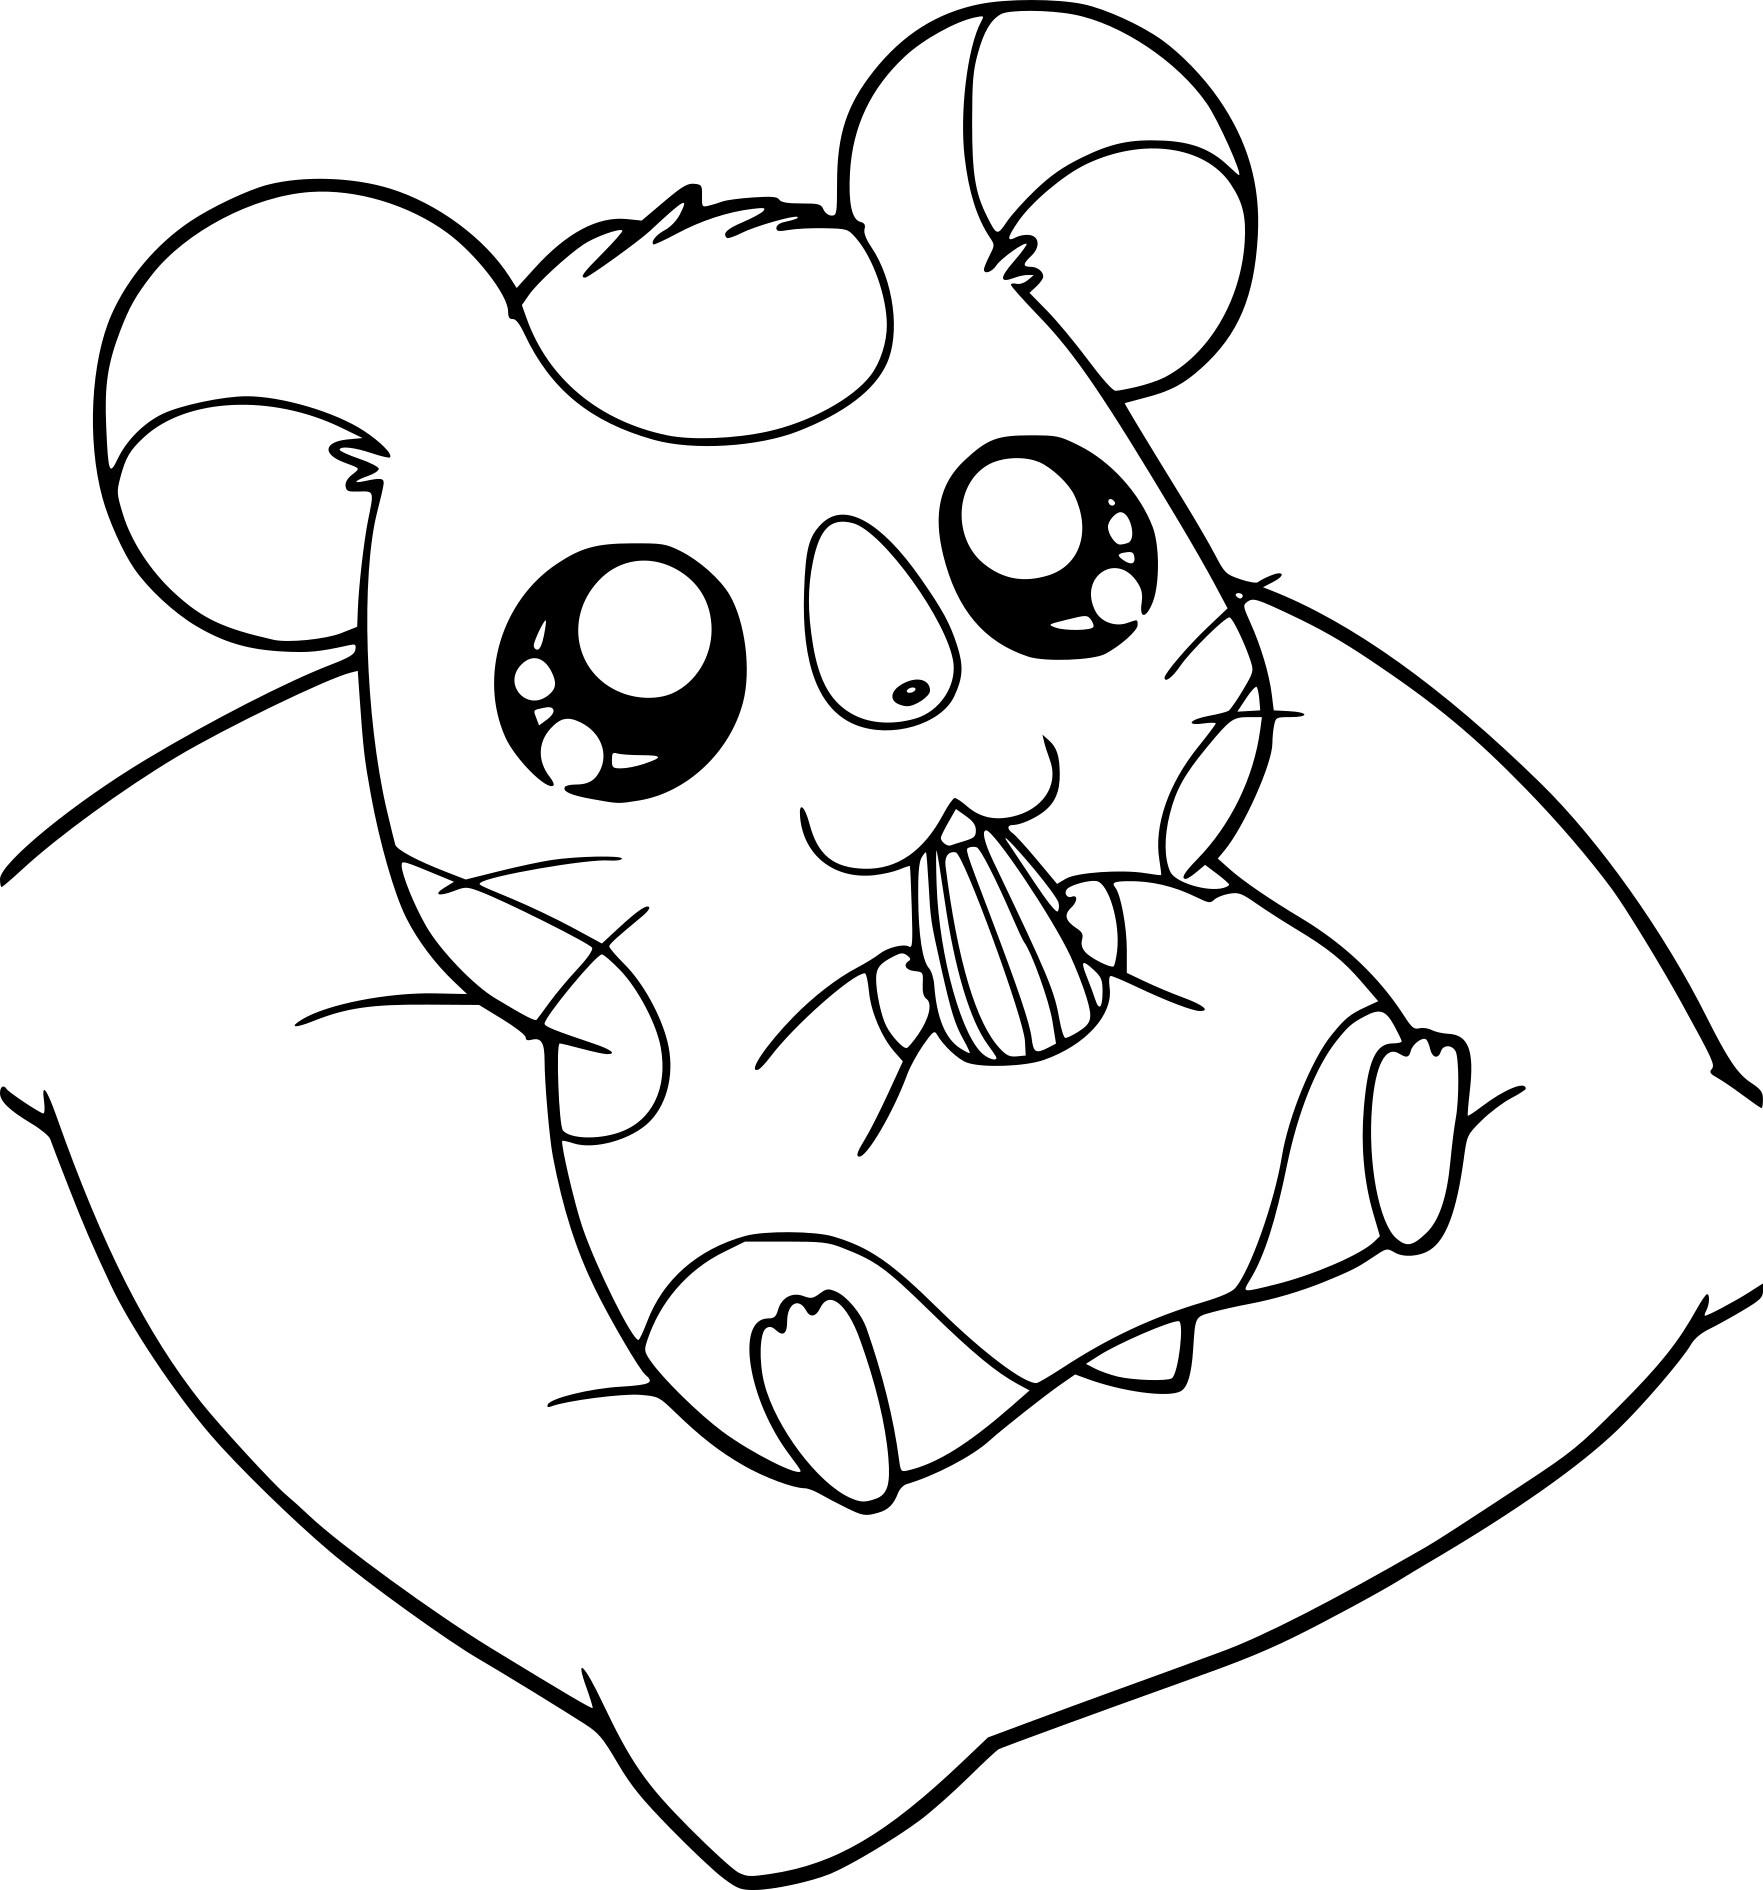 dessin à colorier panda mignon